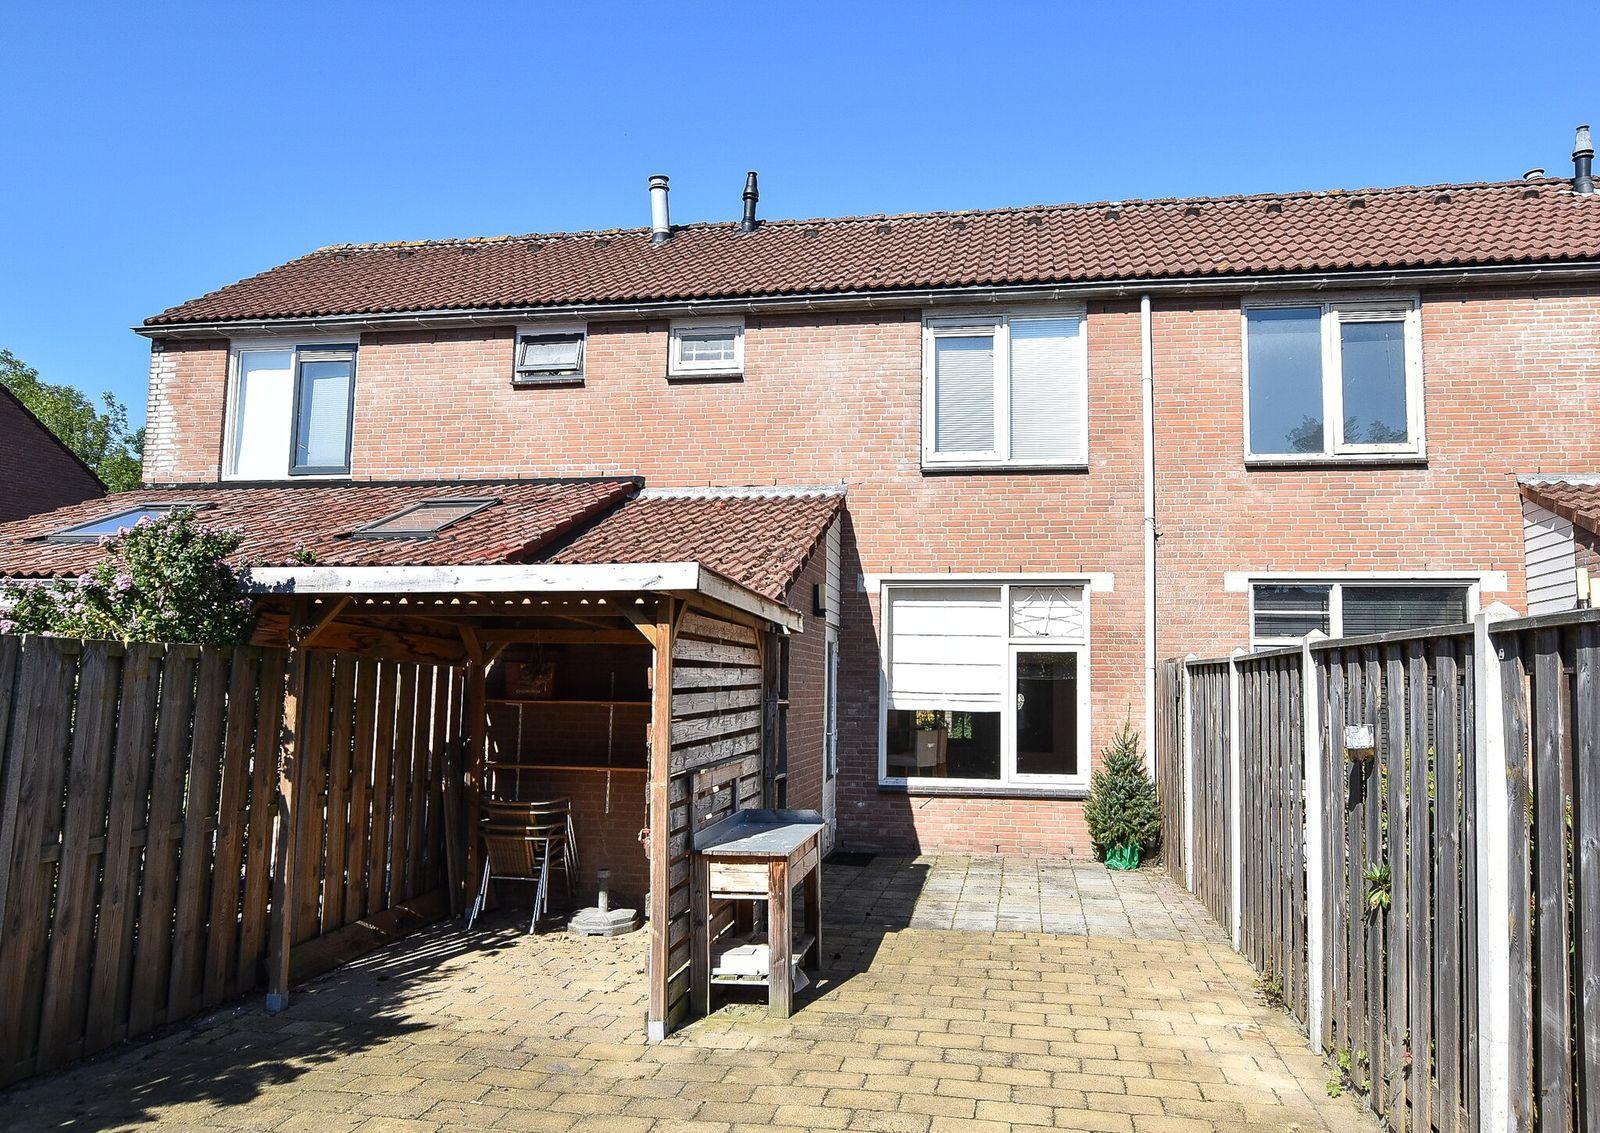 Horst 13 20, Lelystad